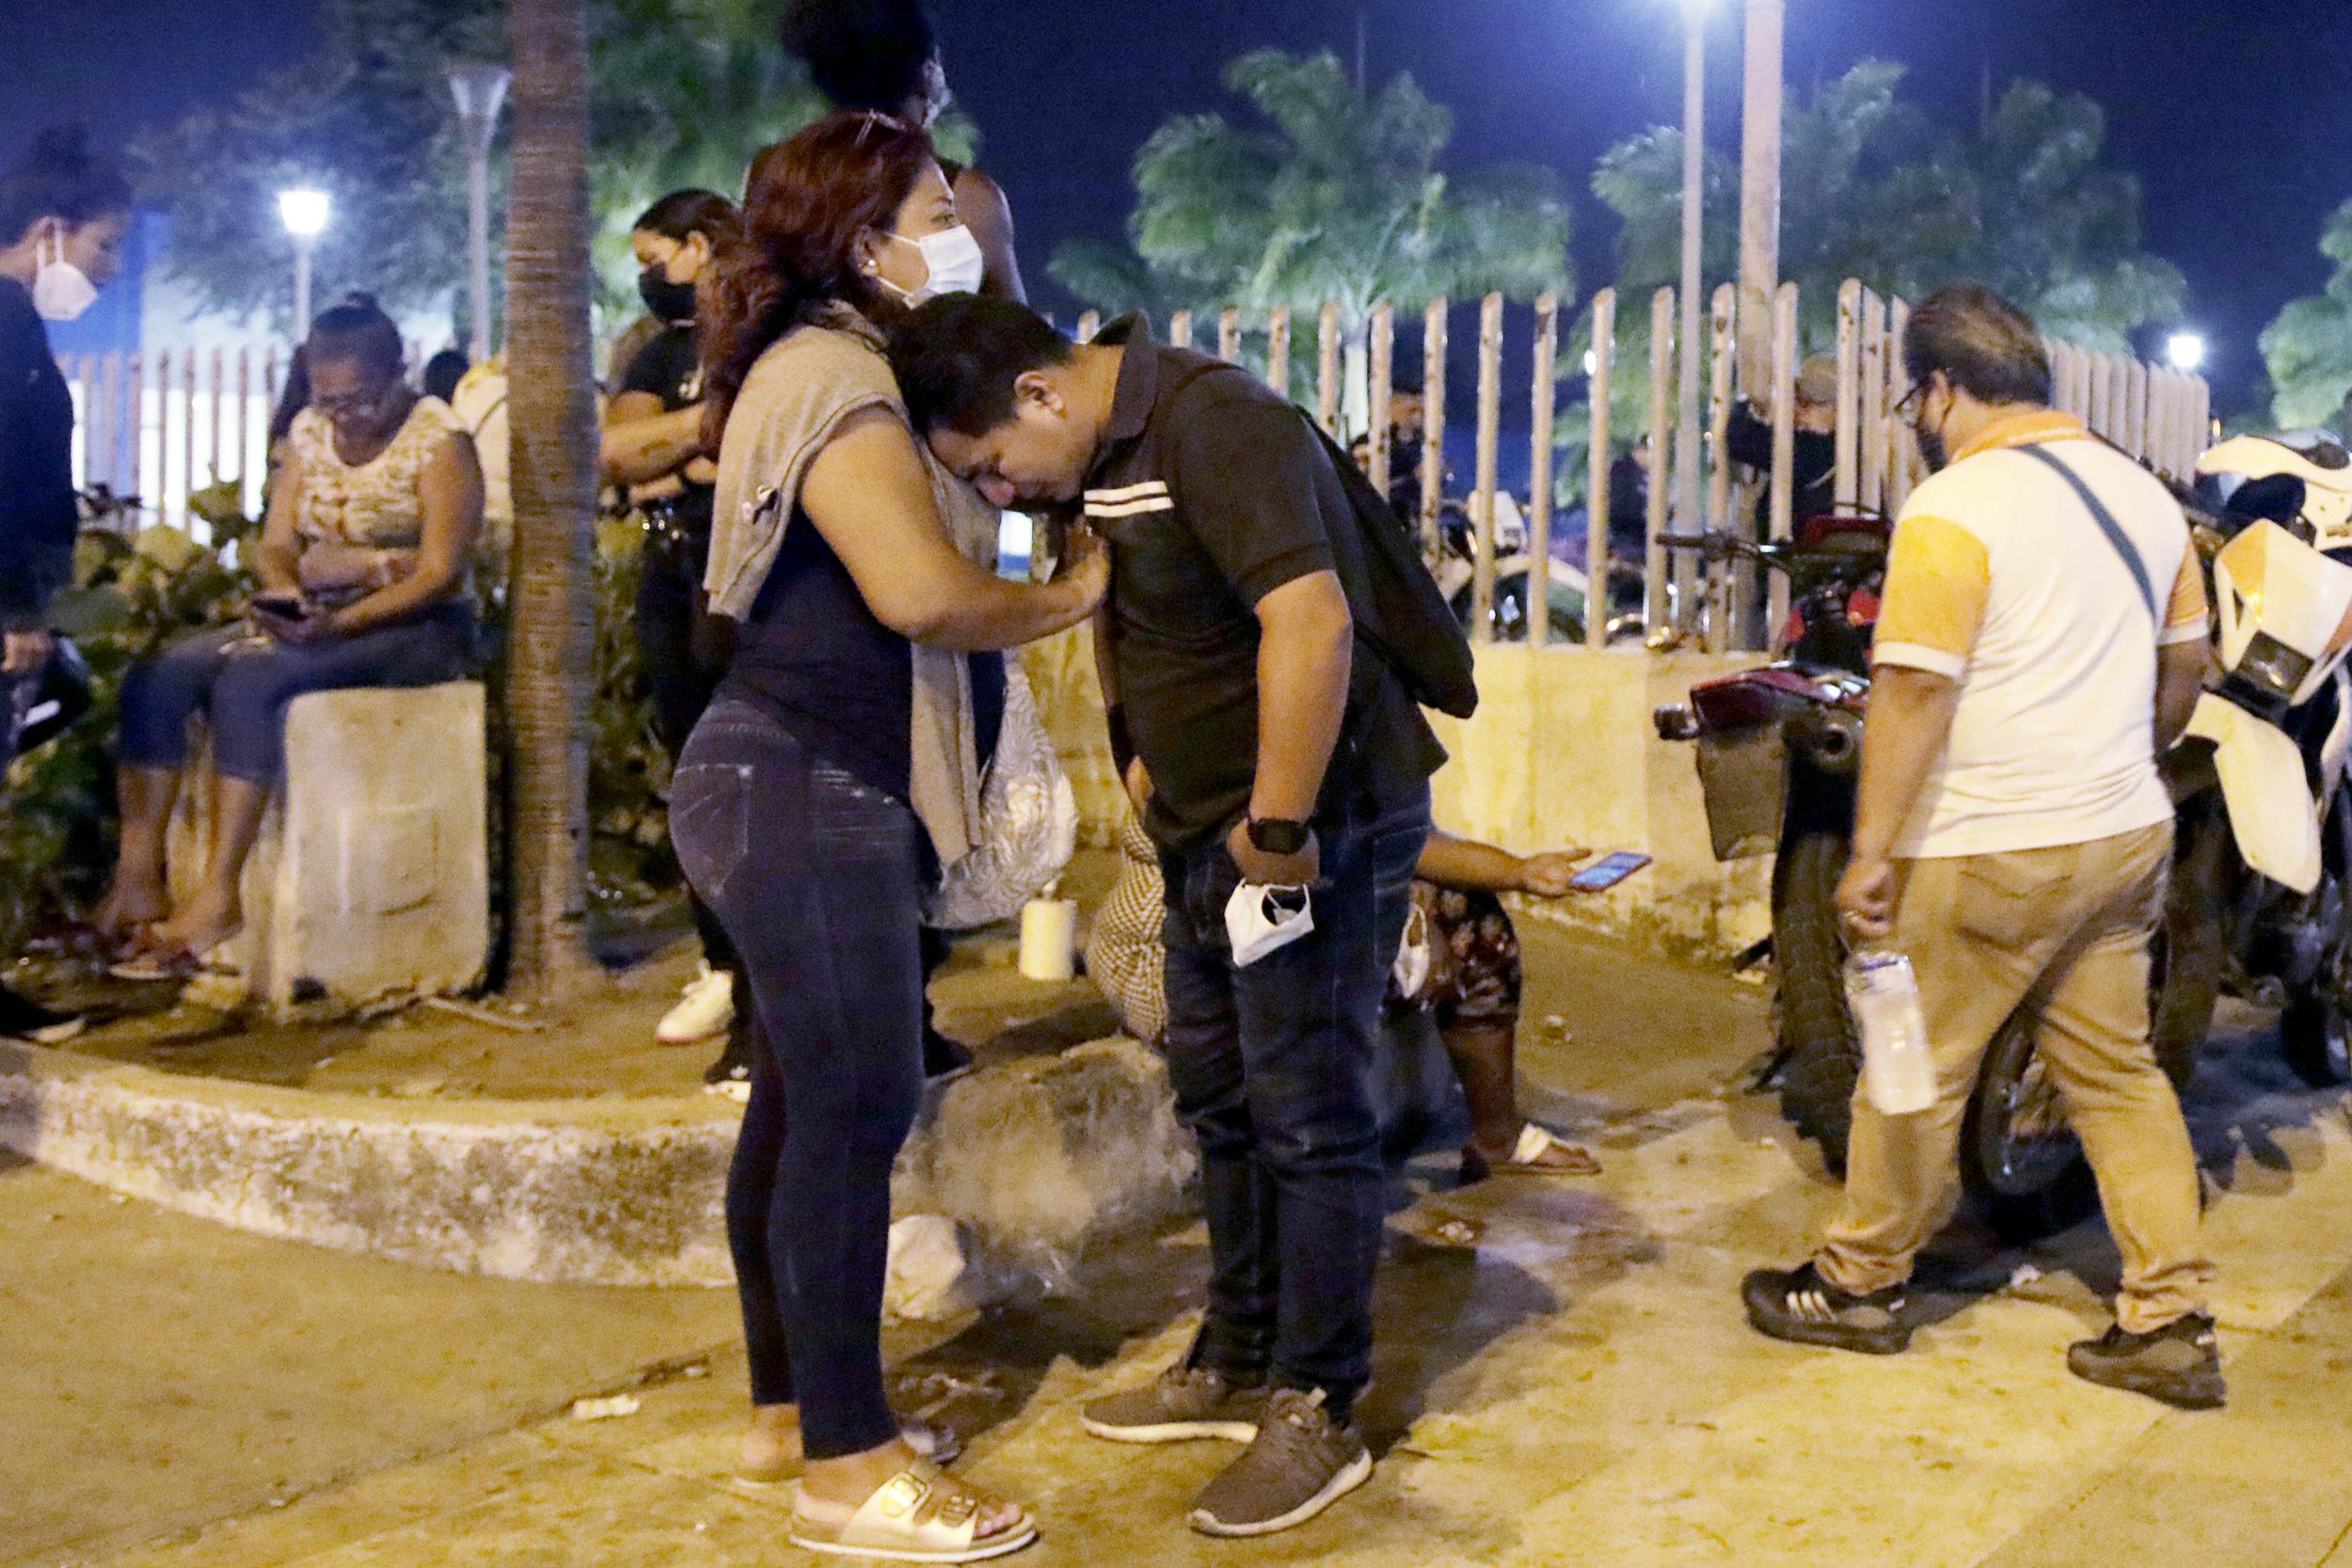 Ecuador declares prison emergency after scores killed in gang battle, some beheaded